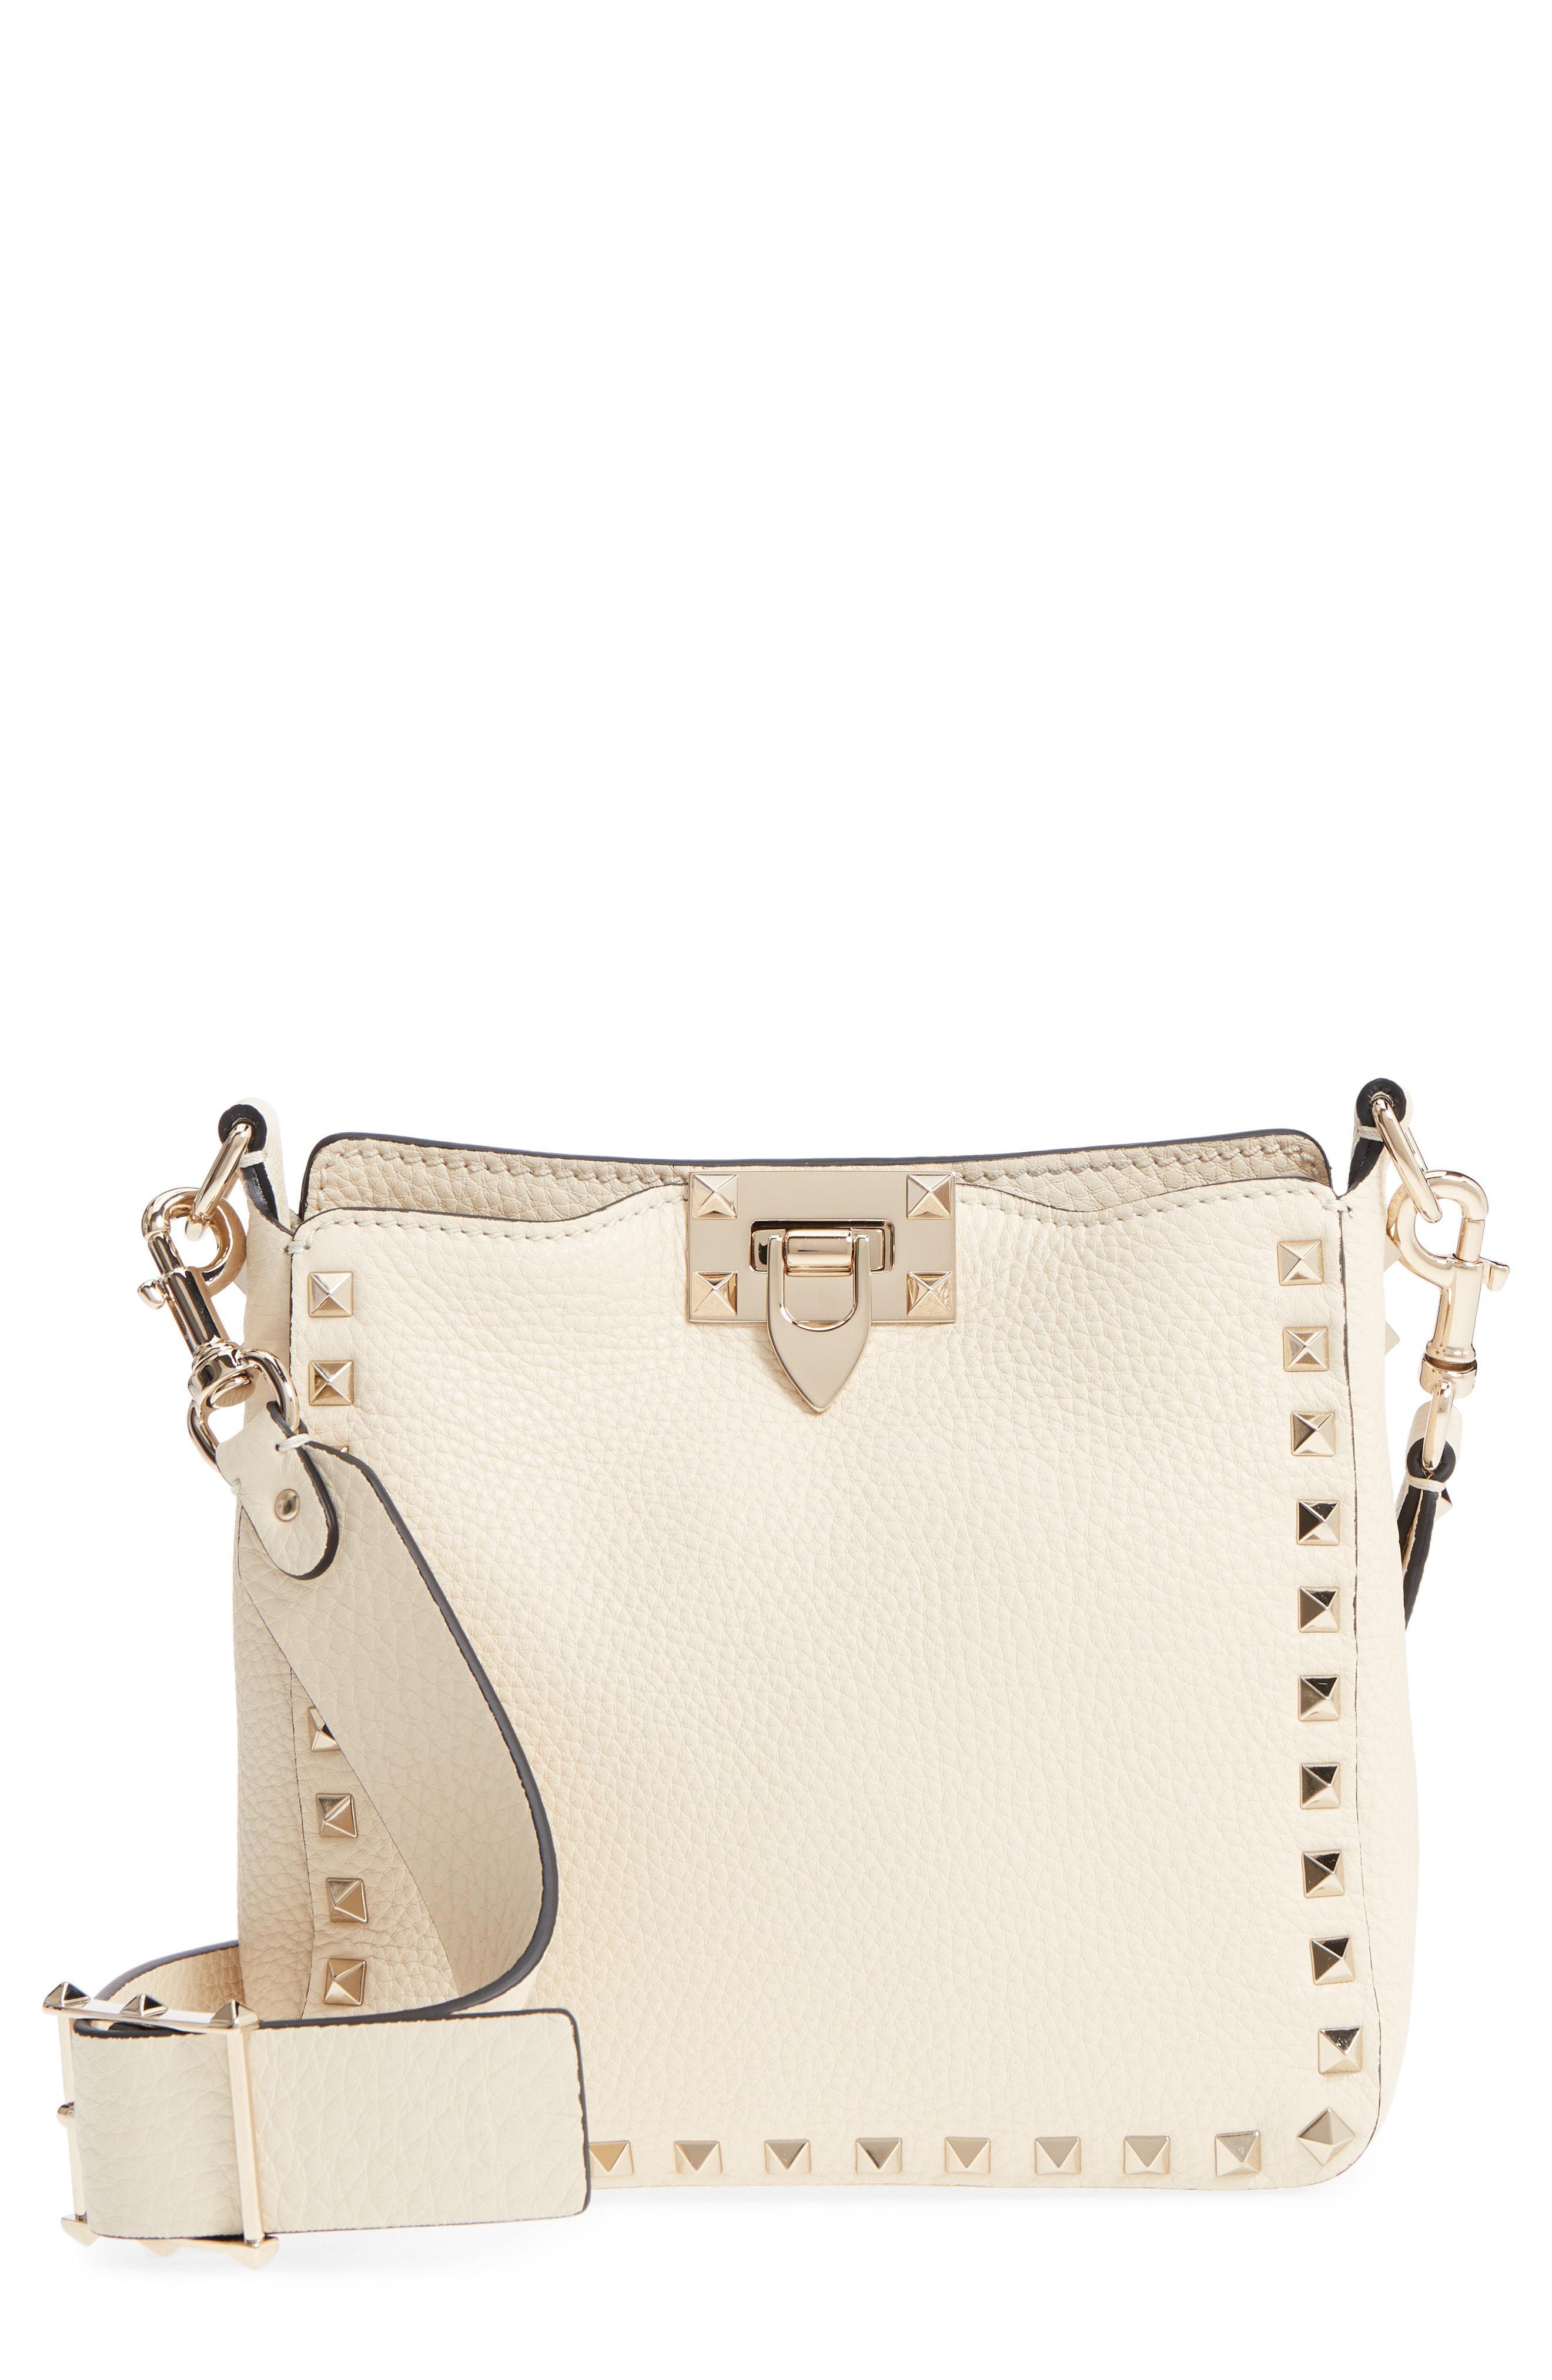 Lyst - Valentino Rockstud Mini Hobo Crossbody Bag - in Natural b865ee4ae0afa